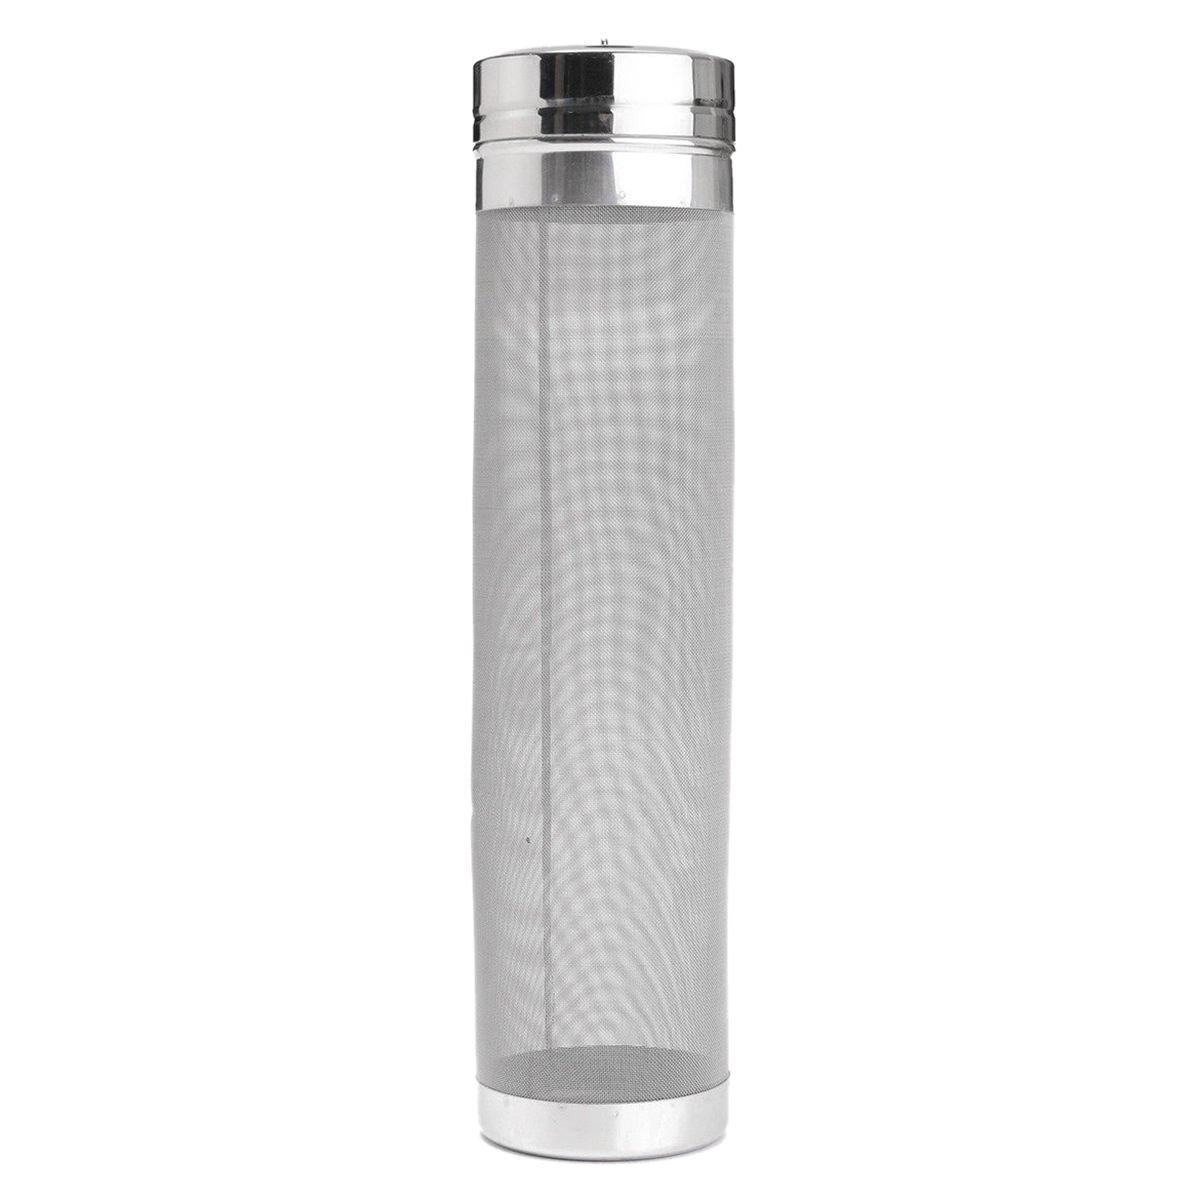 Toogoo 29x7cm Stainless Steel Homebrew Beer Dry Hopper Filter With 300 Micron Mesh For Cornelius Kegs Corny Keg